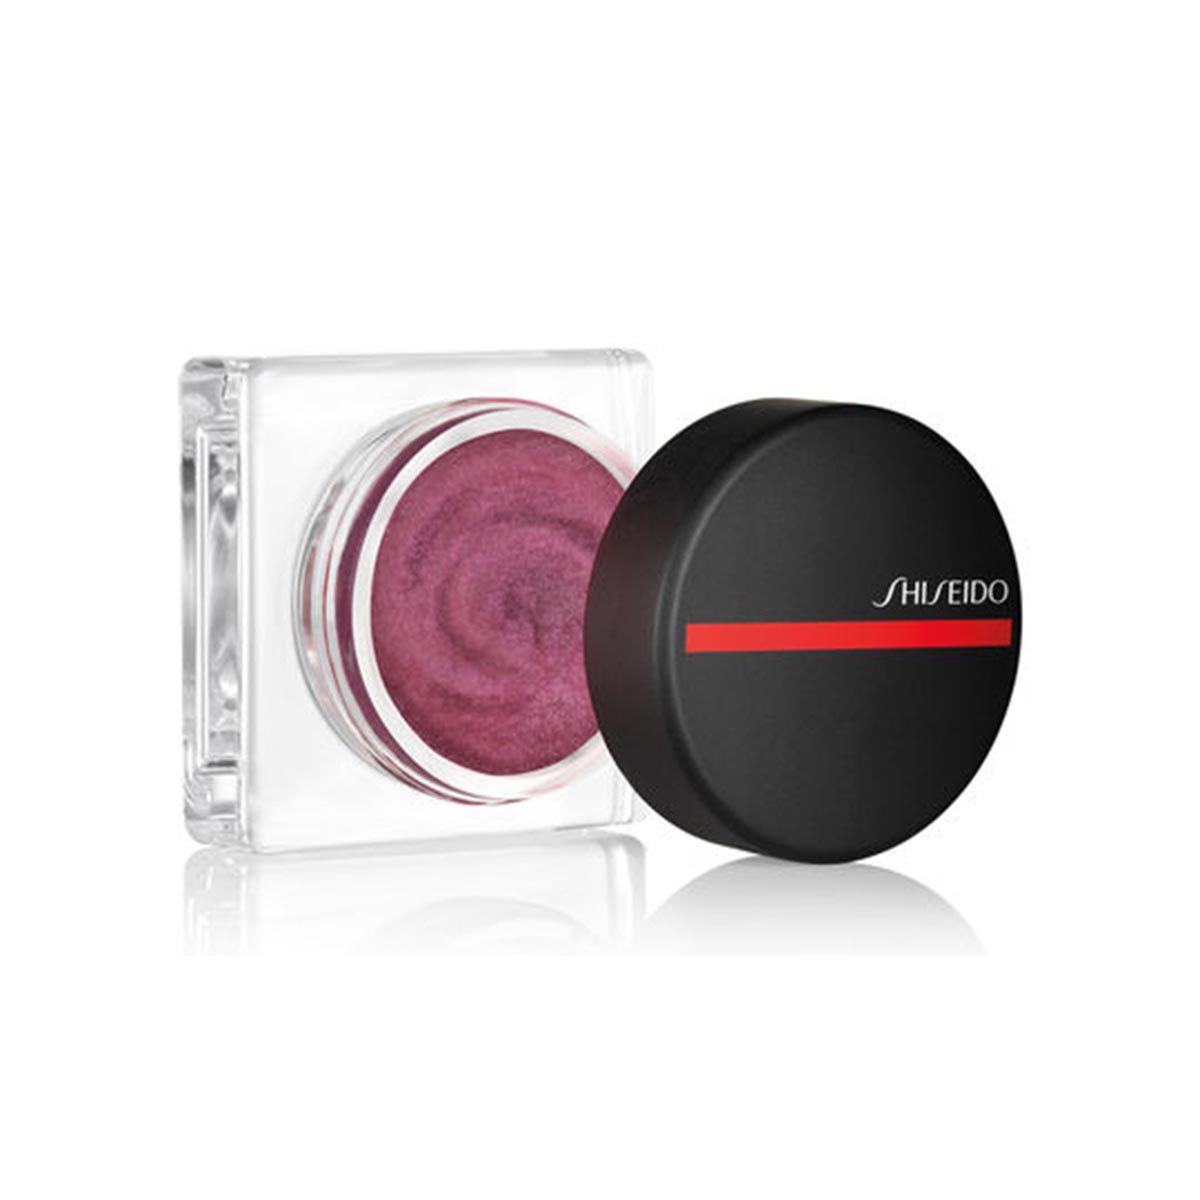 Shiseido minimalist whipped powder blush 05